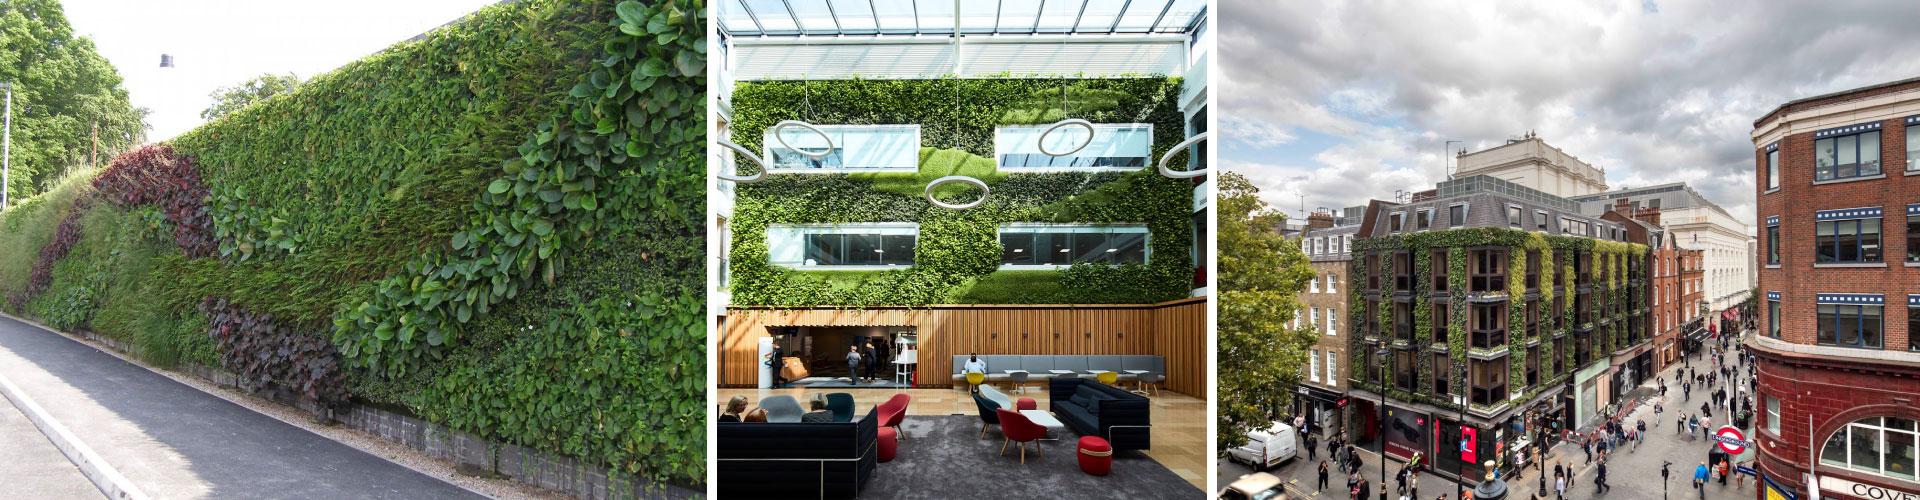 Product Slide Living Walls